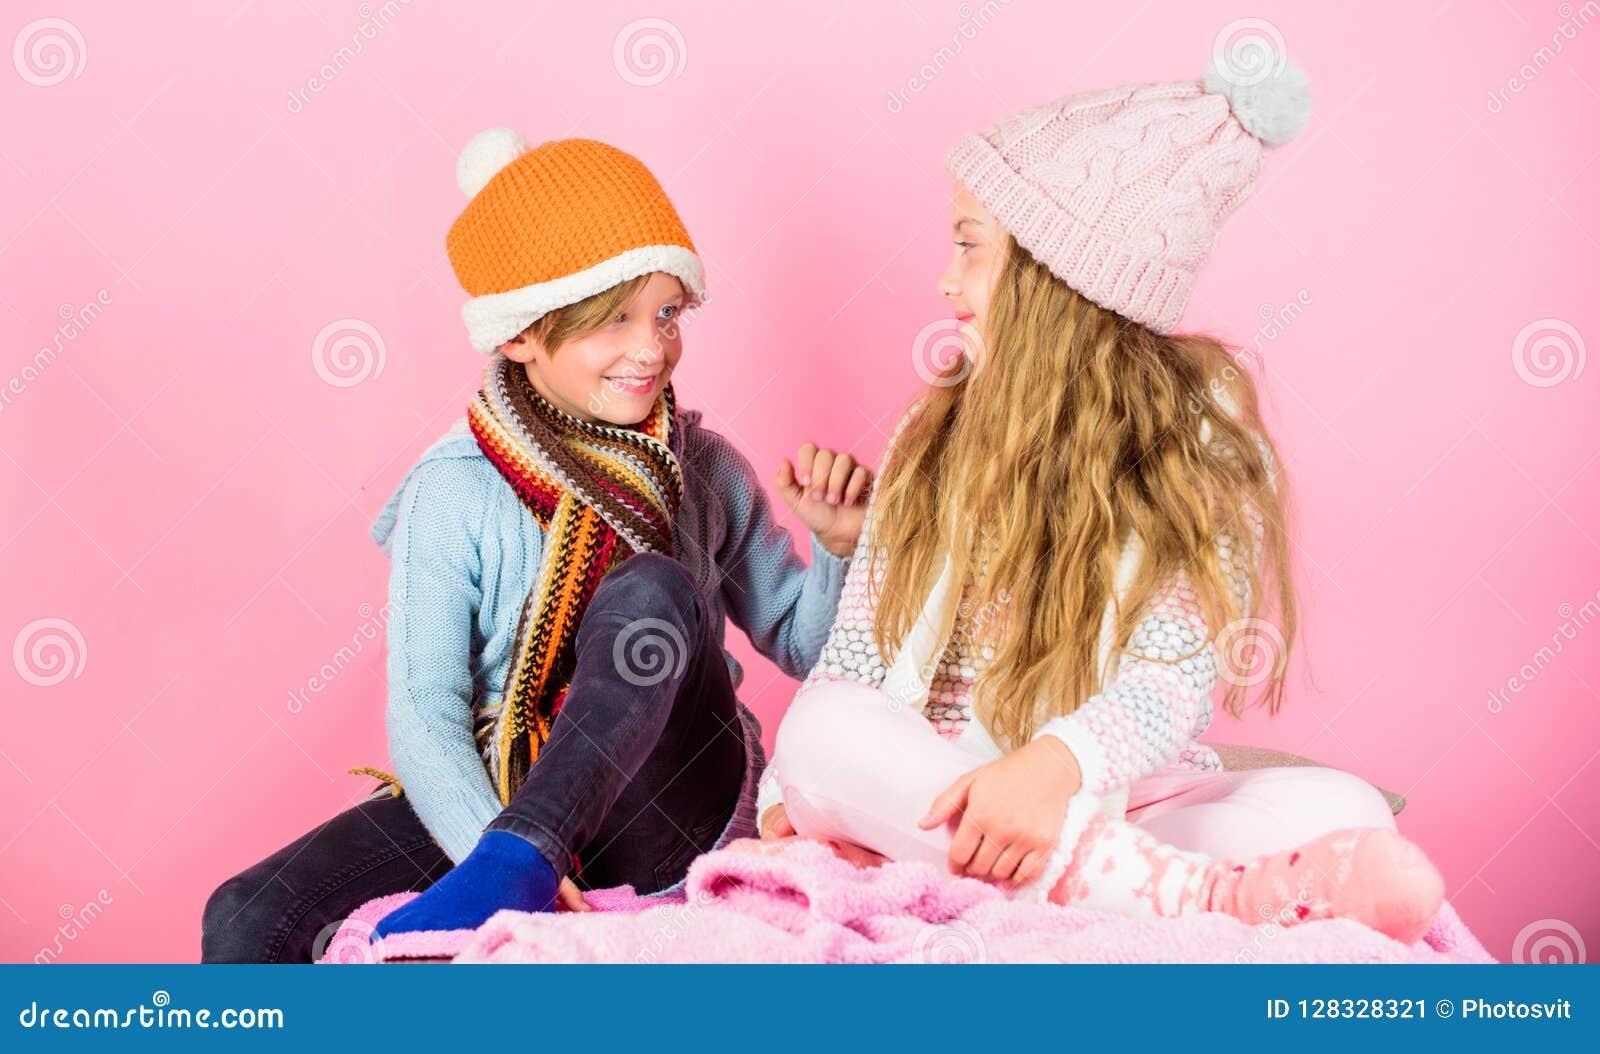 3d8d13b2971 Πλεκτά ένδυση χειμερινά καπέλα κοριτσιών και αγοριών Εξαρτήματα και  ενδύματα μόδας χειμερινής εποχής Πλεκτά παιδιά χειμερινά